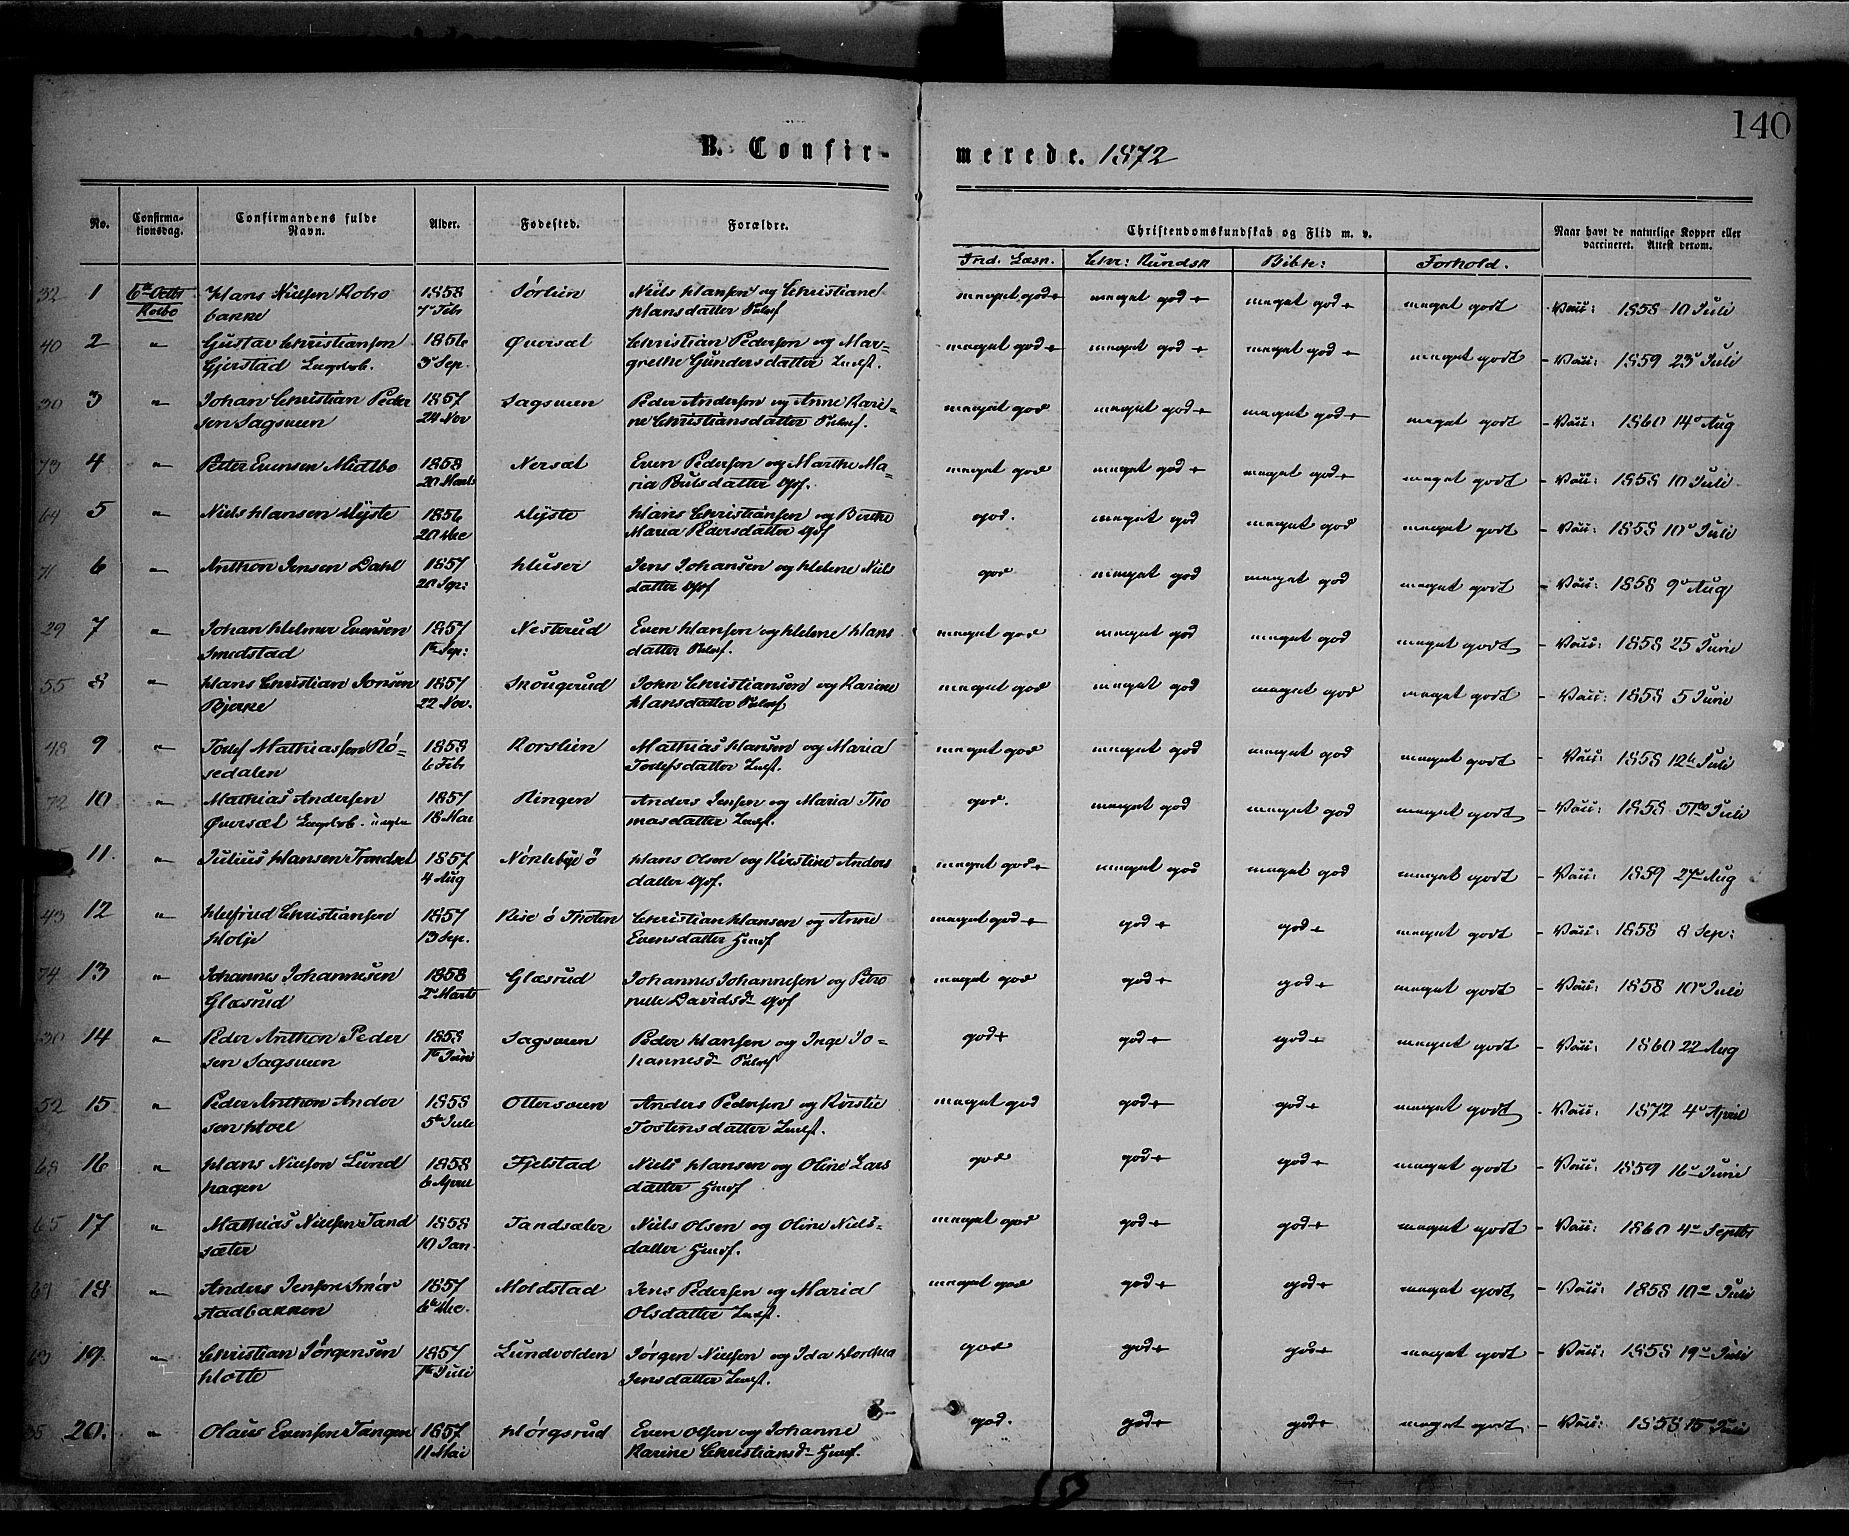 SAH, Vestre Toten prestekontor, H/Ha/Haa/L0008: Ministerialbok nr. 8, 1870-1877, s. 140